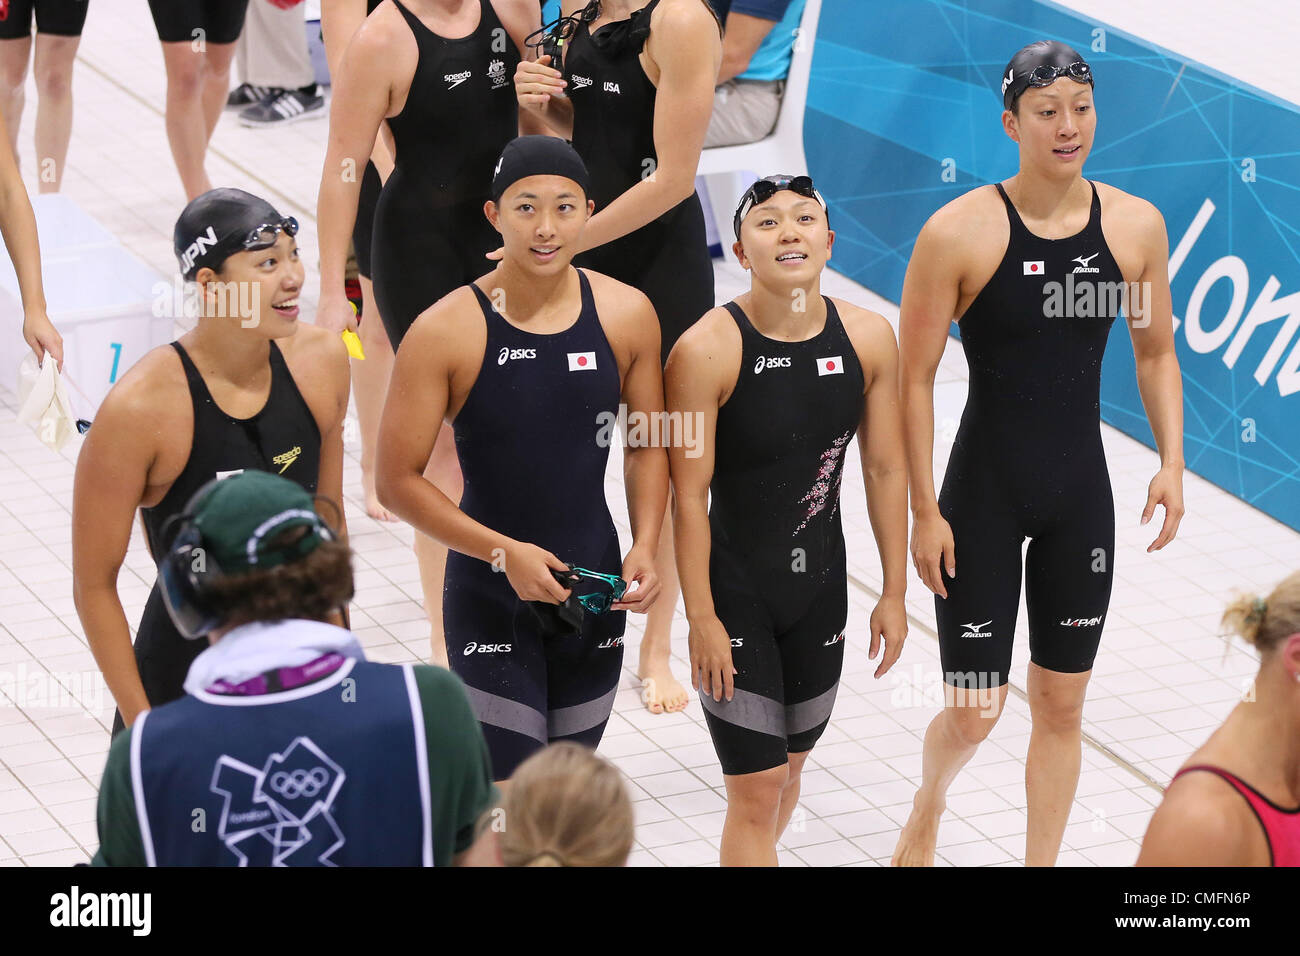 L à R) Haruka Ueda (JPN), Suzuki (JPN) Satomi, Yuka Kato